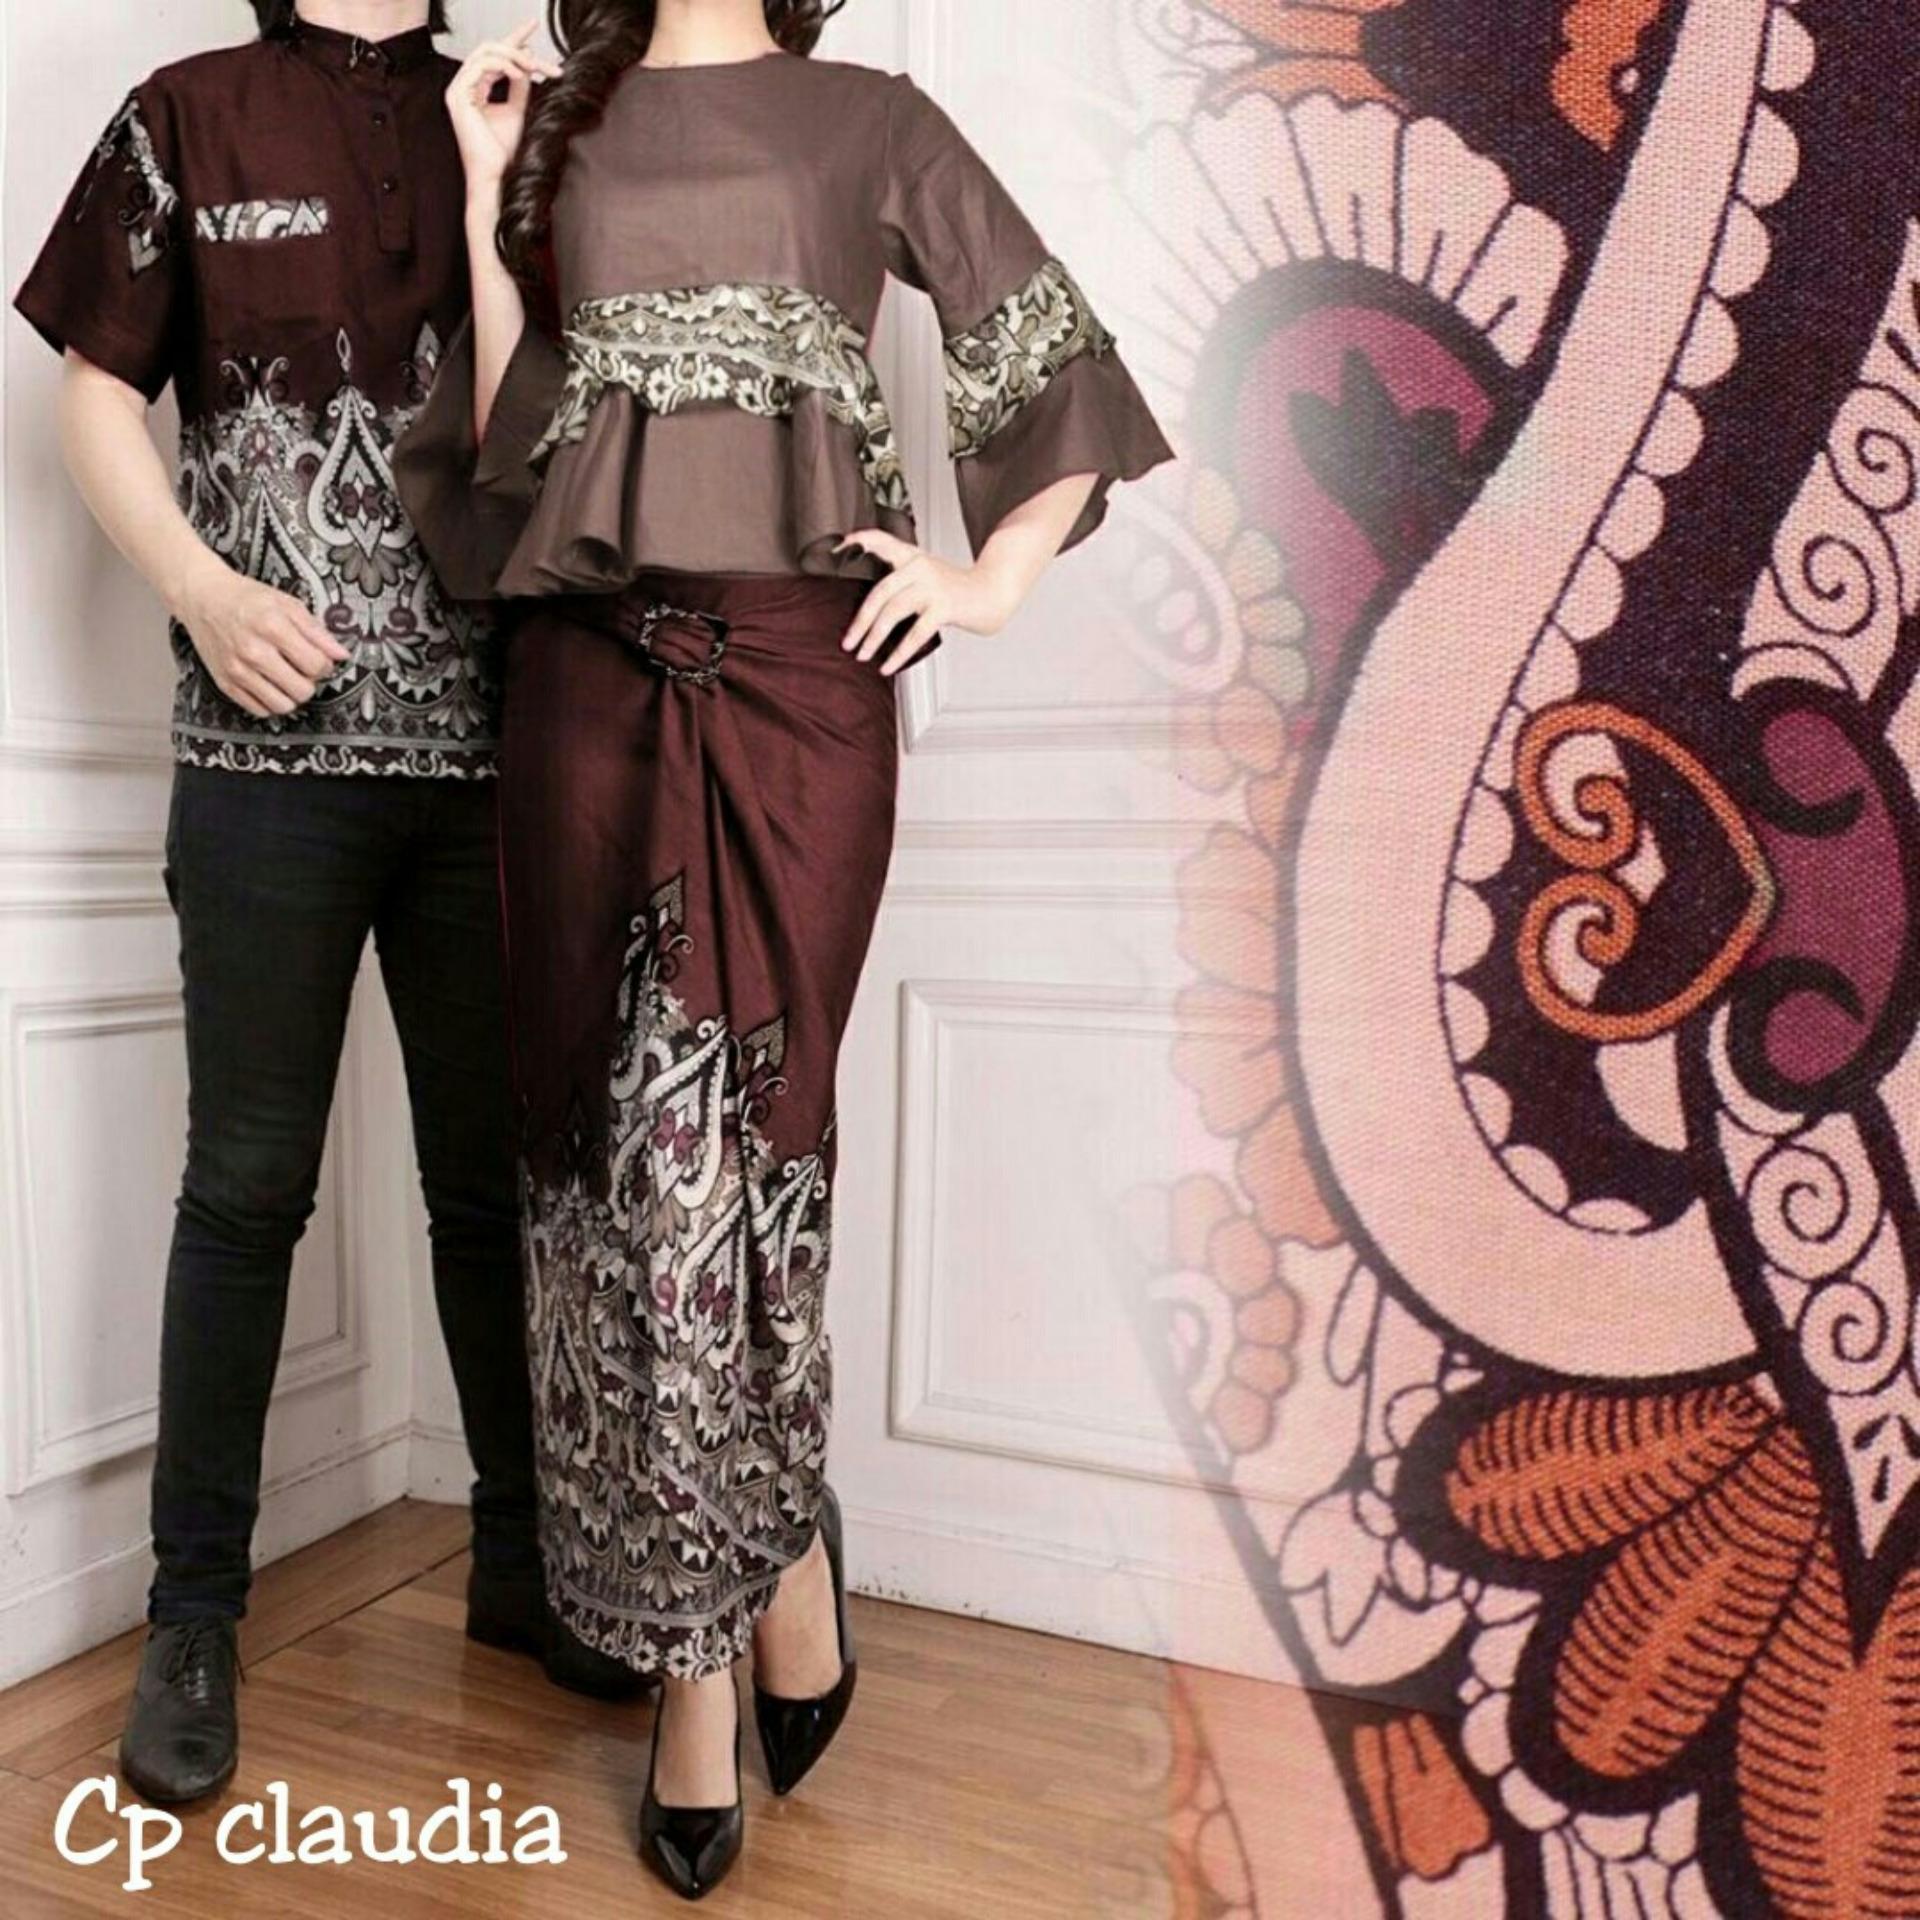 Ladies Fashion Couple Kemeja Batik Pria Muslim Kebaya KutuBaru Modern Dress  Batik Pasangan Mira 3in1 Rok 98dcf9ef55